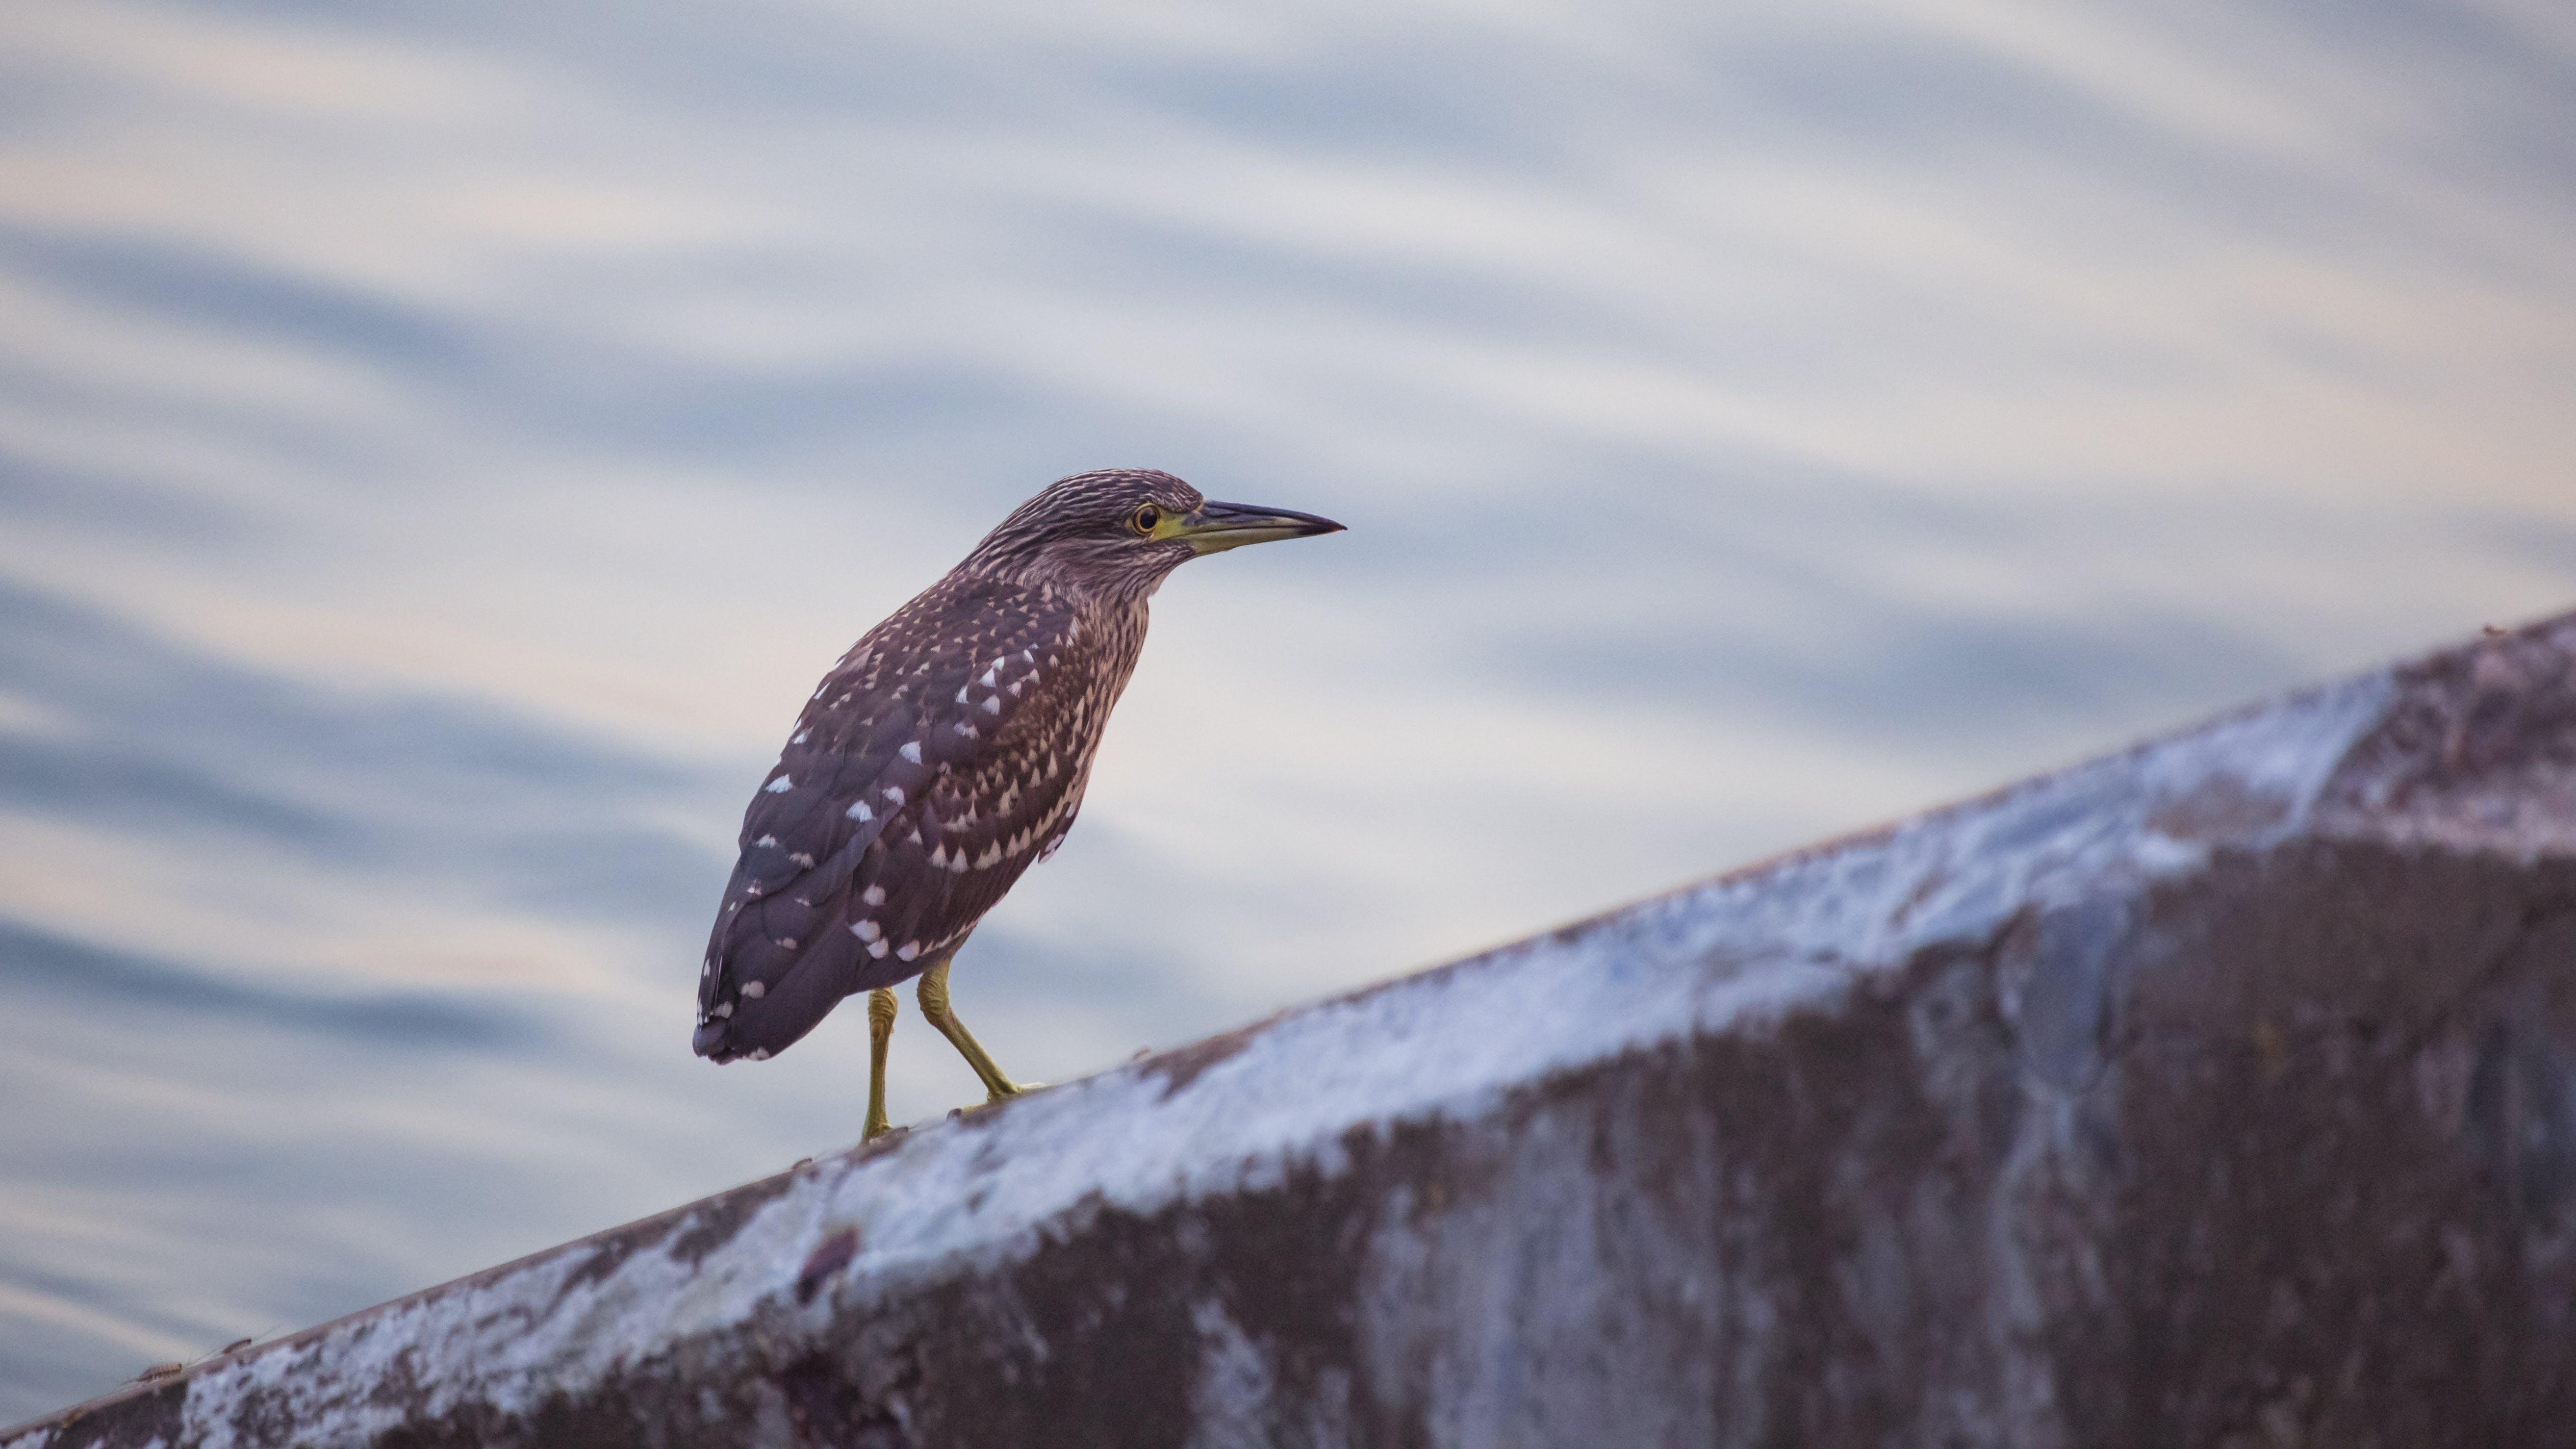 Selective Focus Photography of Green Heron